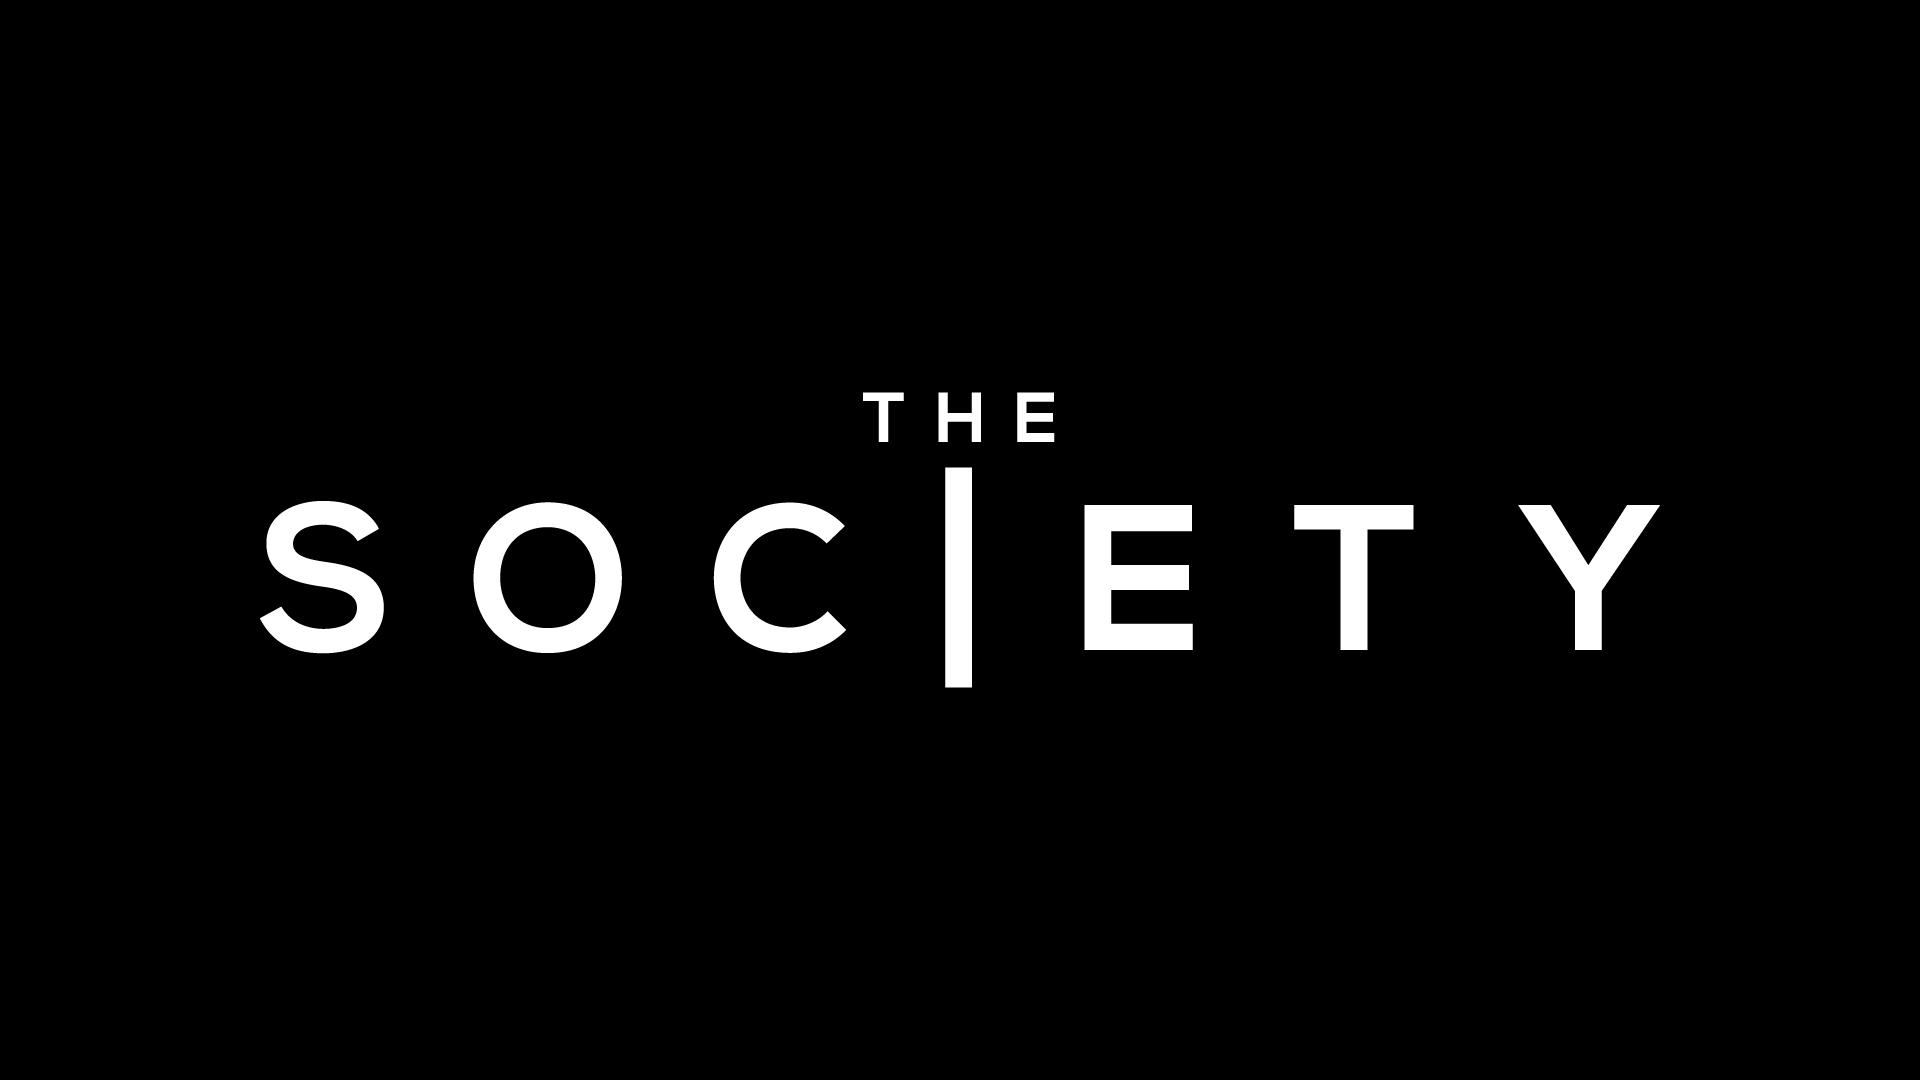 The Society (TV Series 2019